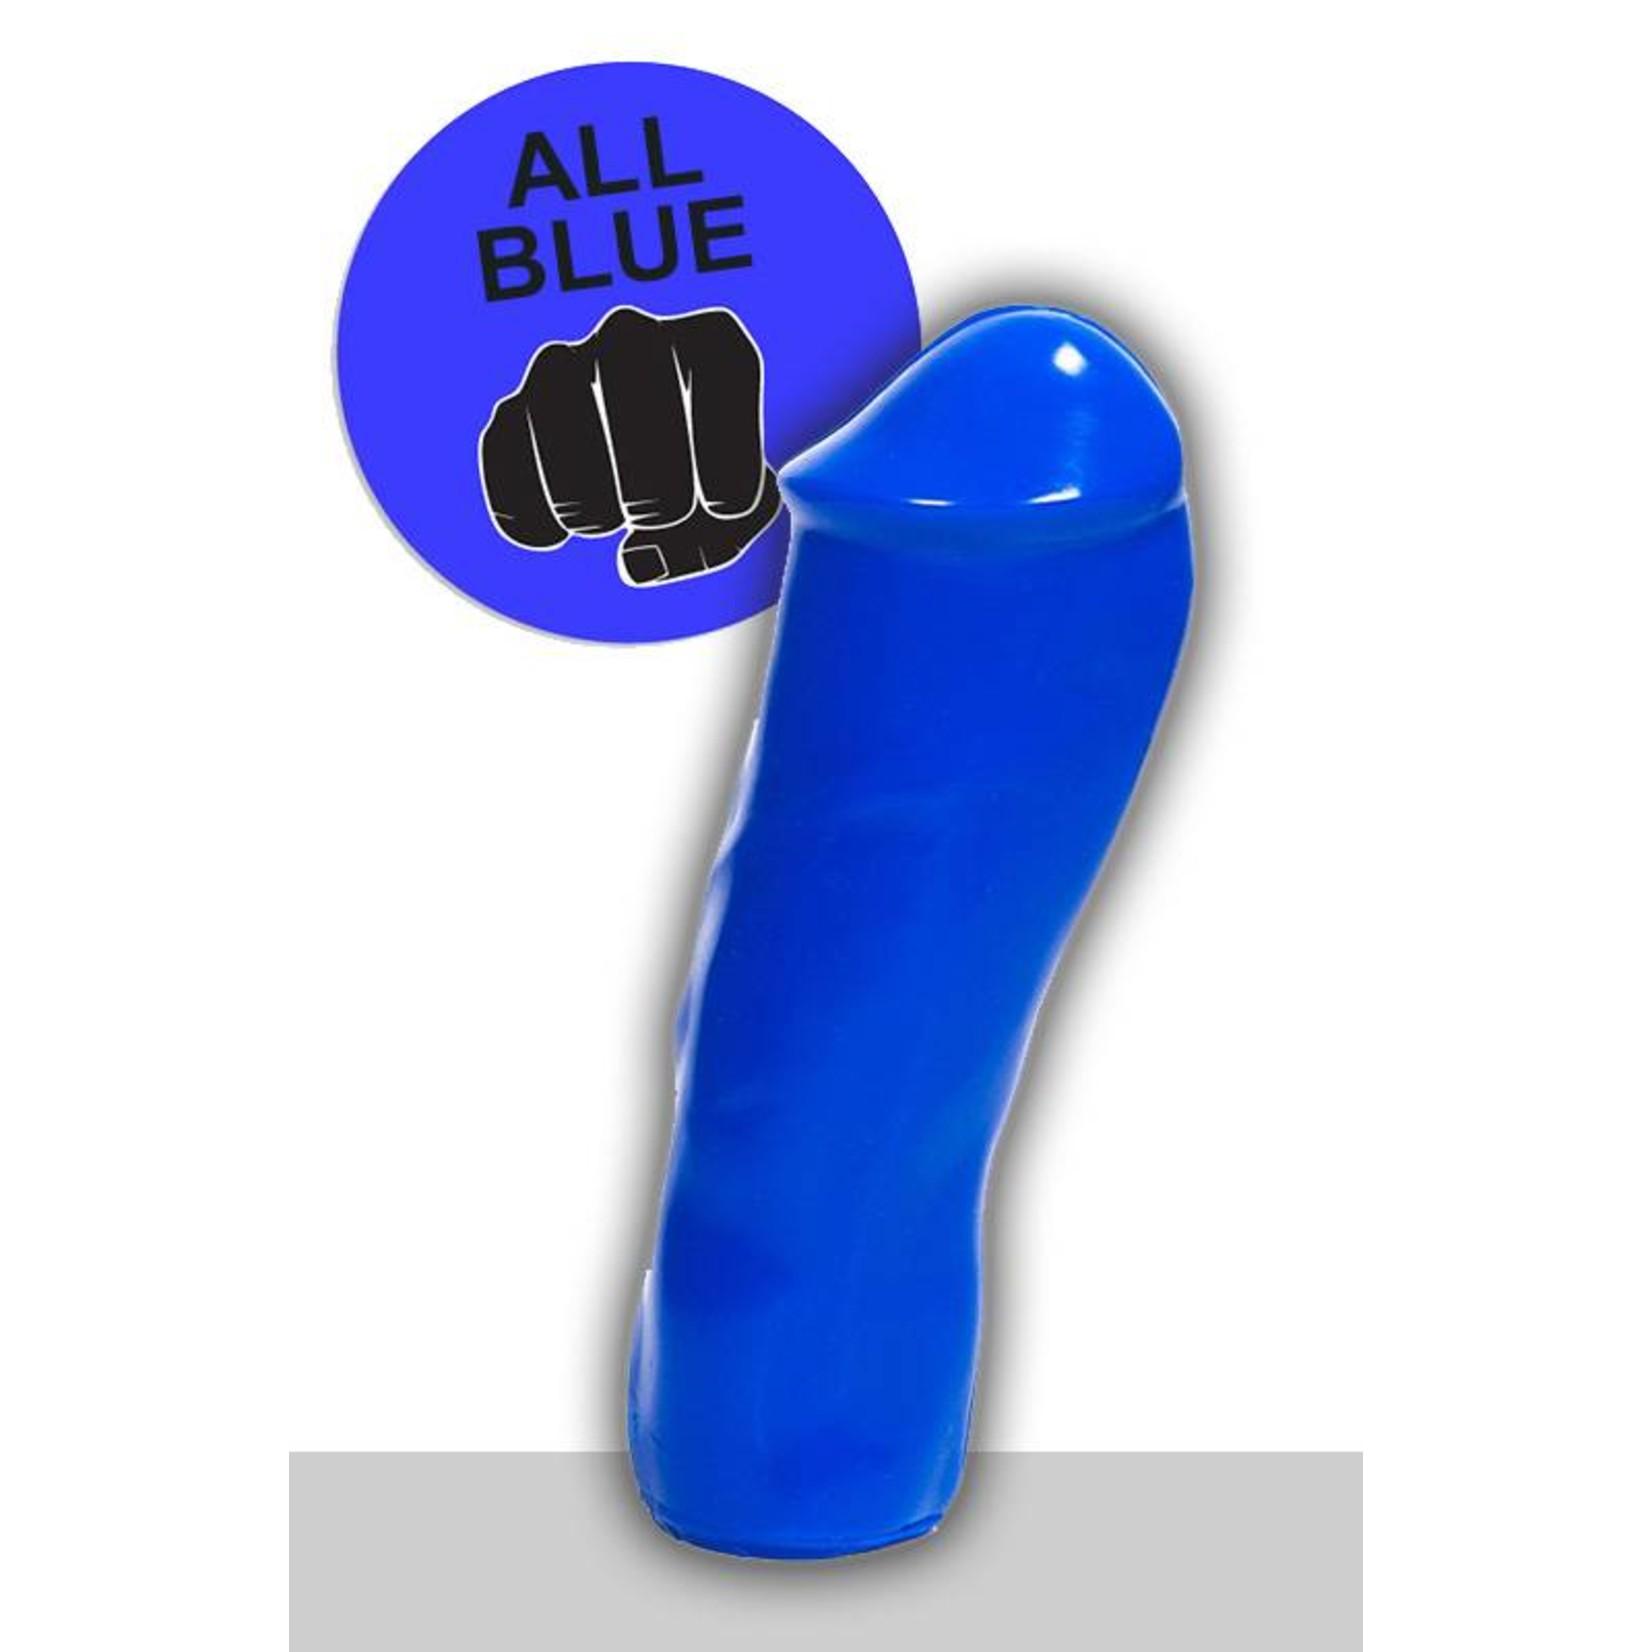 All Black All Blue Dildo - ABB 47